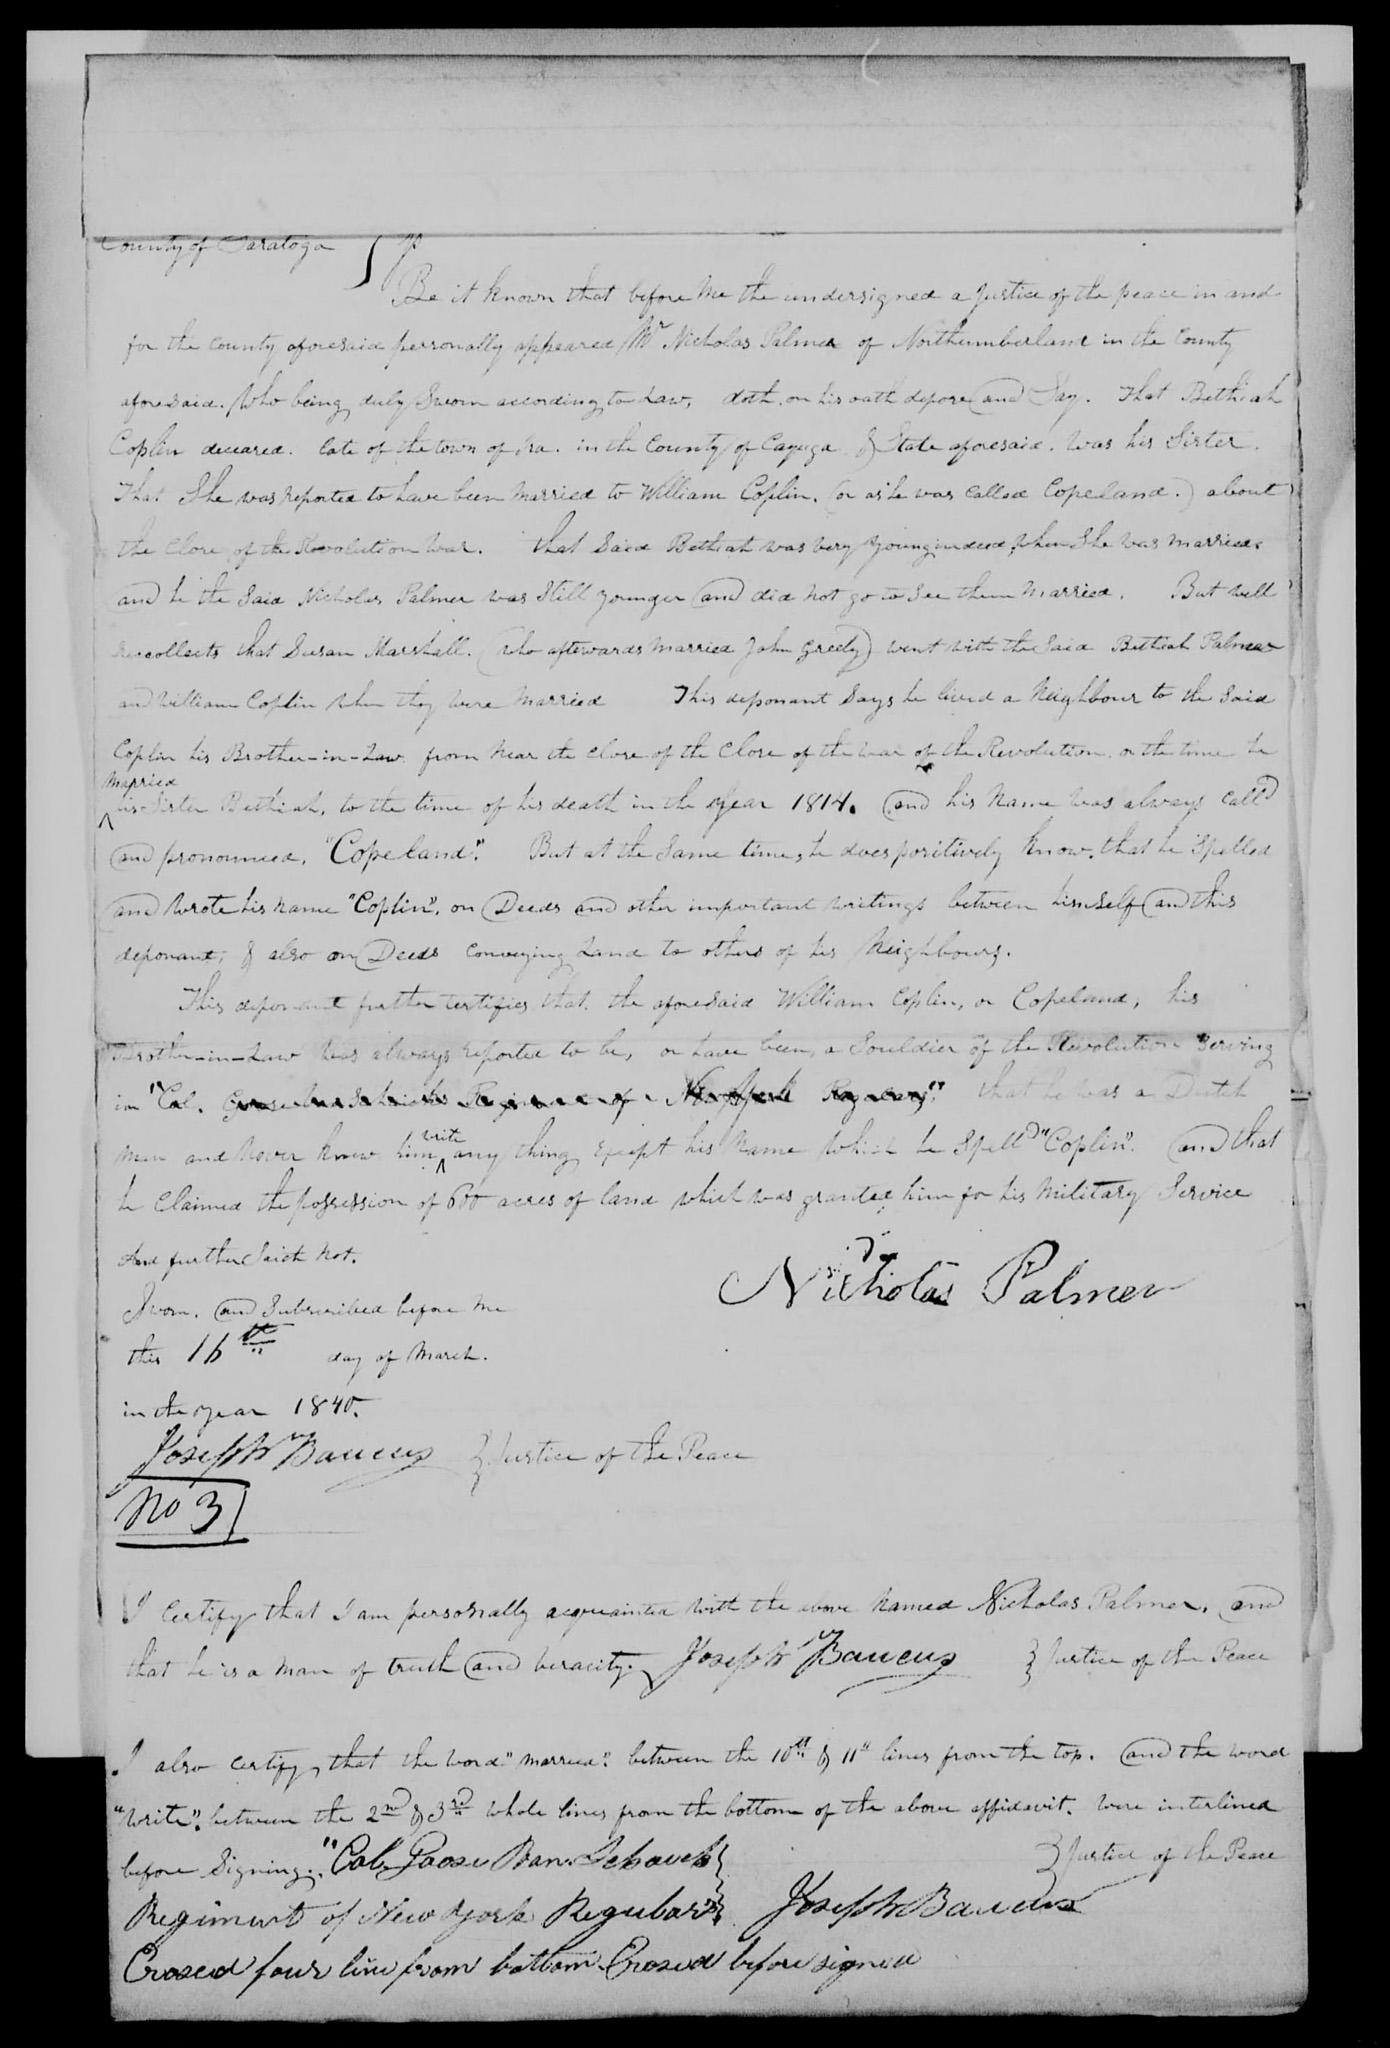 Nicholas Palmer affidavit on 16 Mar 1840